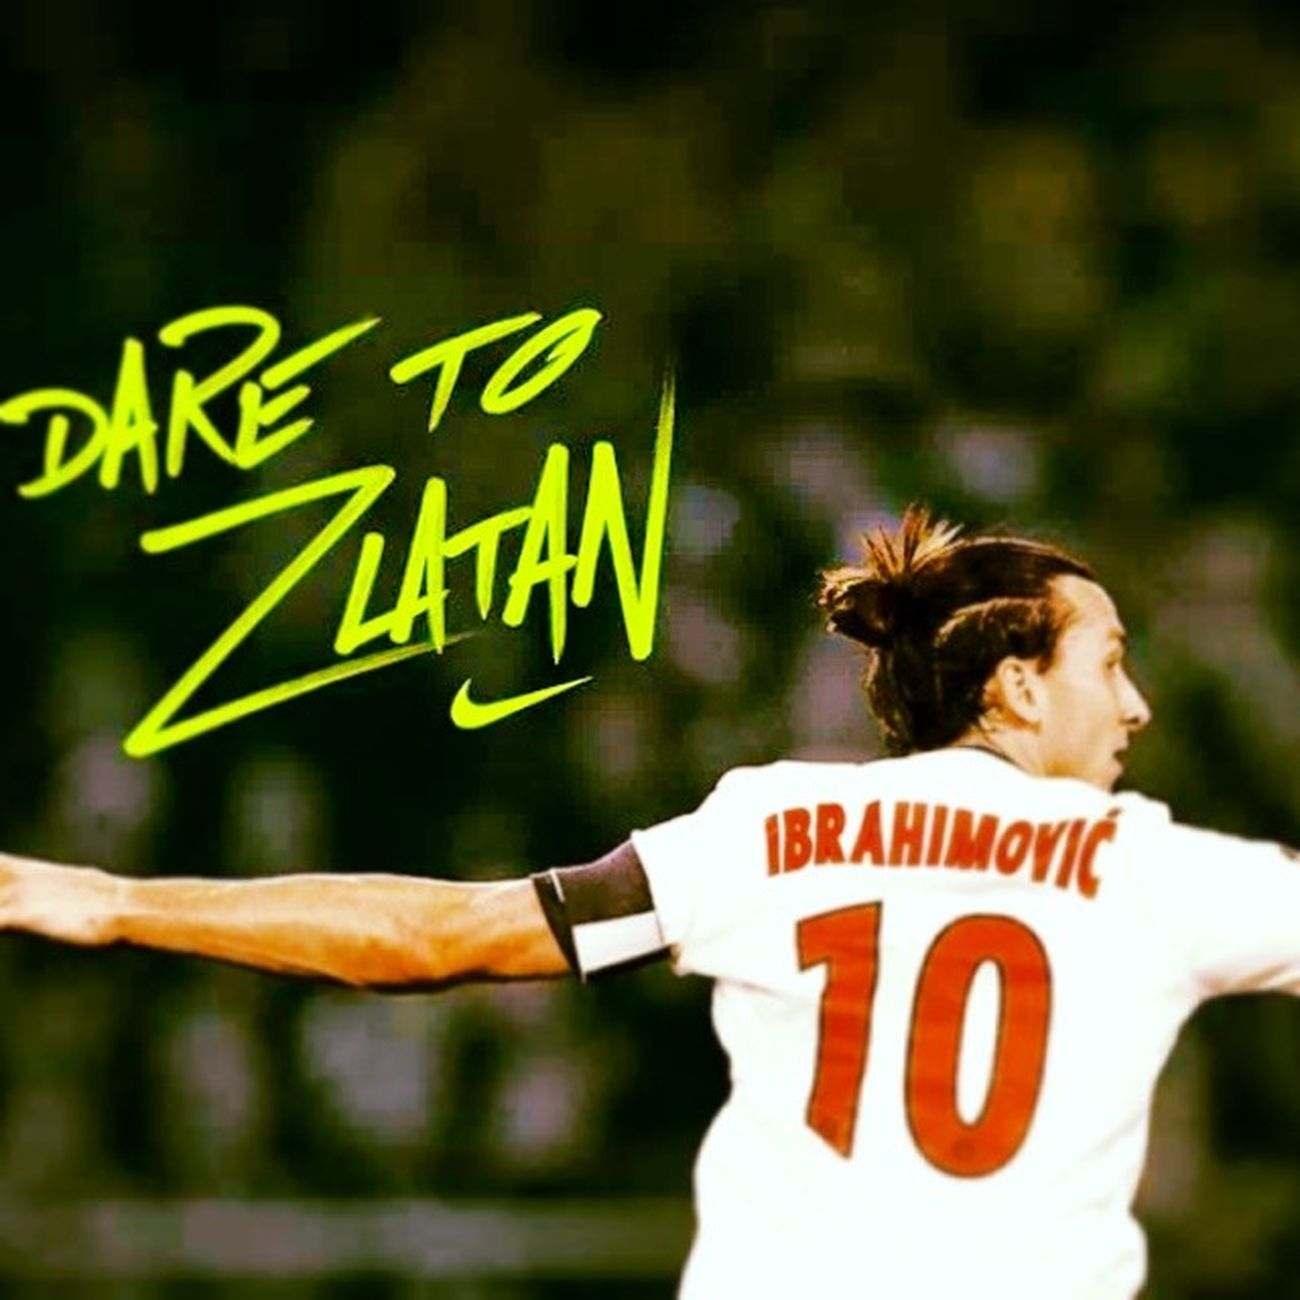 DareToZlatan Congratulation FantastiGoal Ibrakadabra Zlatan FootballArt seiunmostro :-) ZlatanNonTemeNessuno Psg